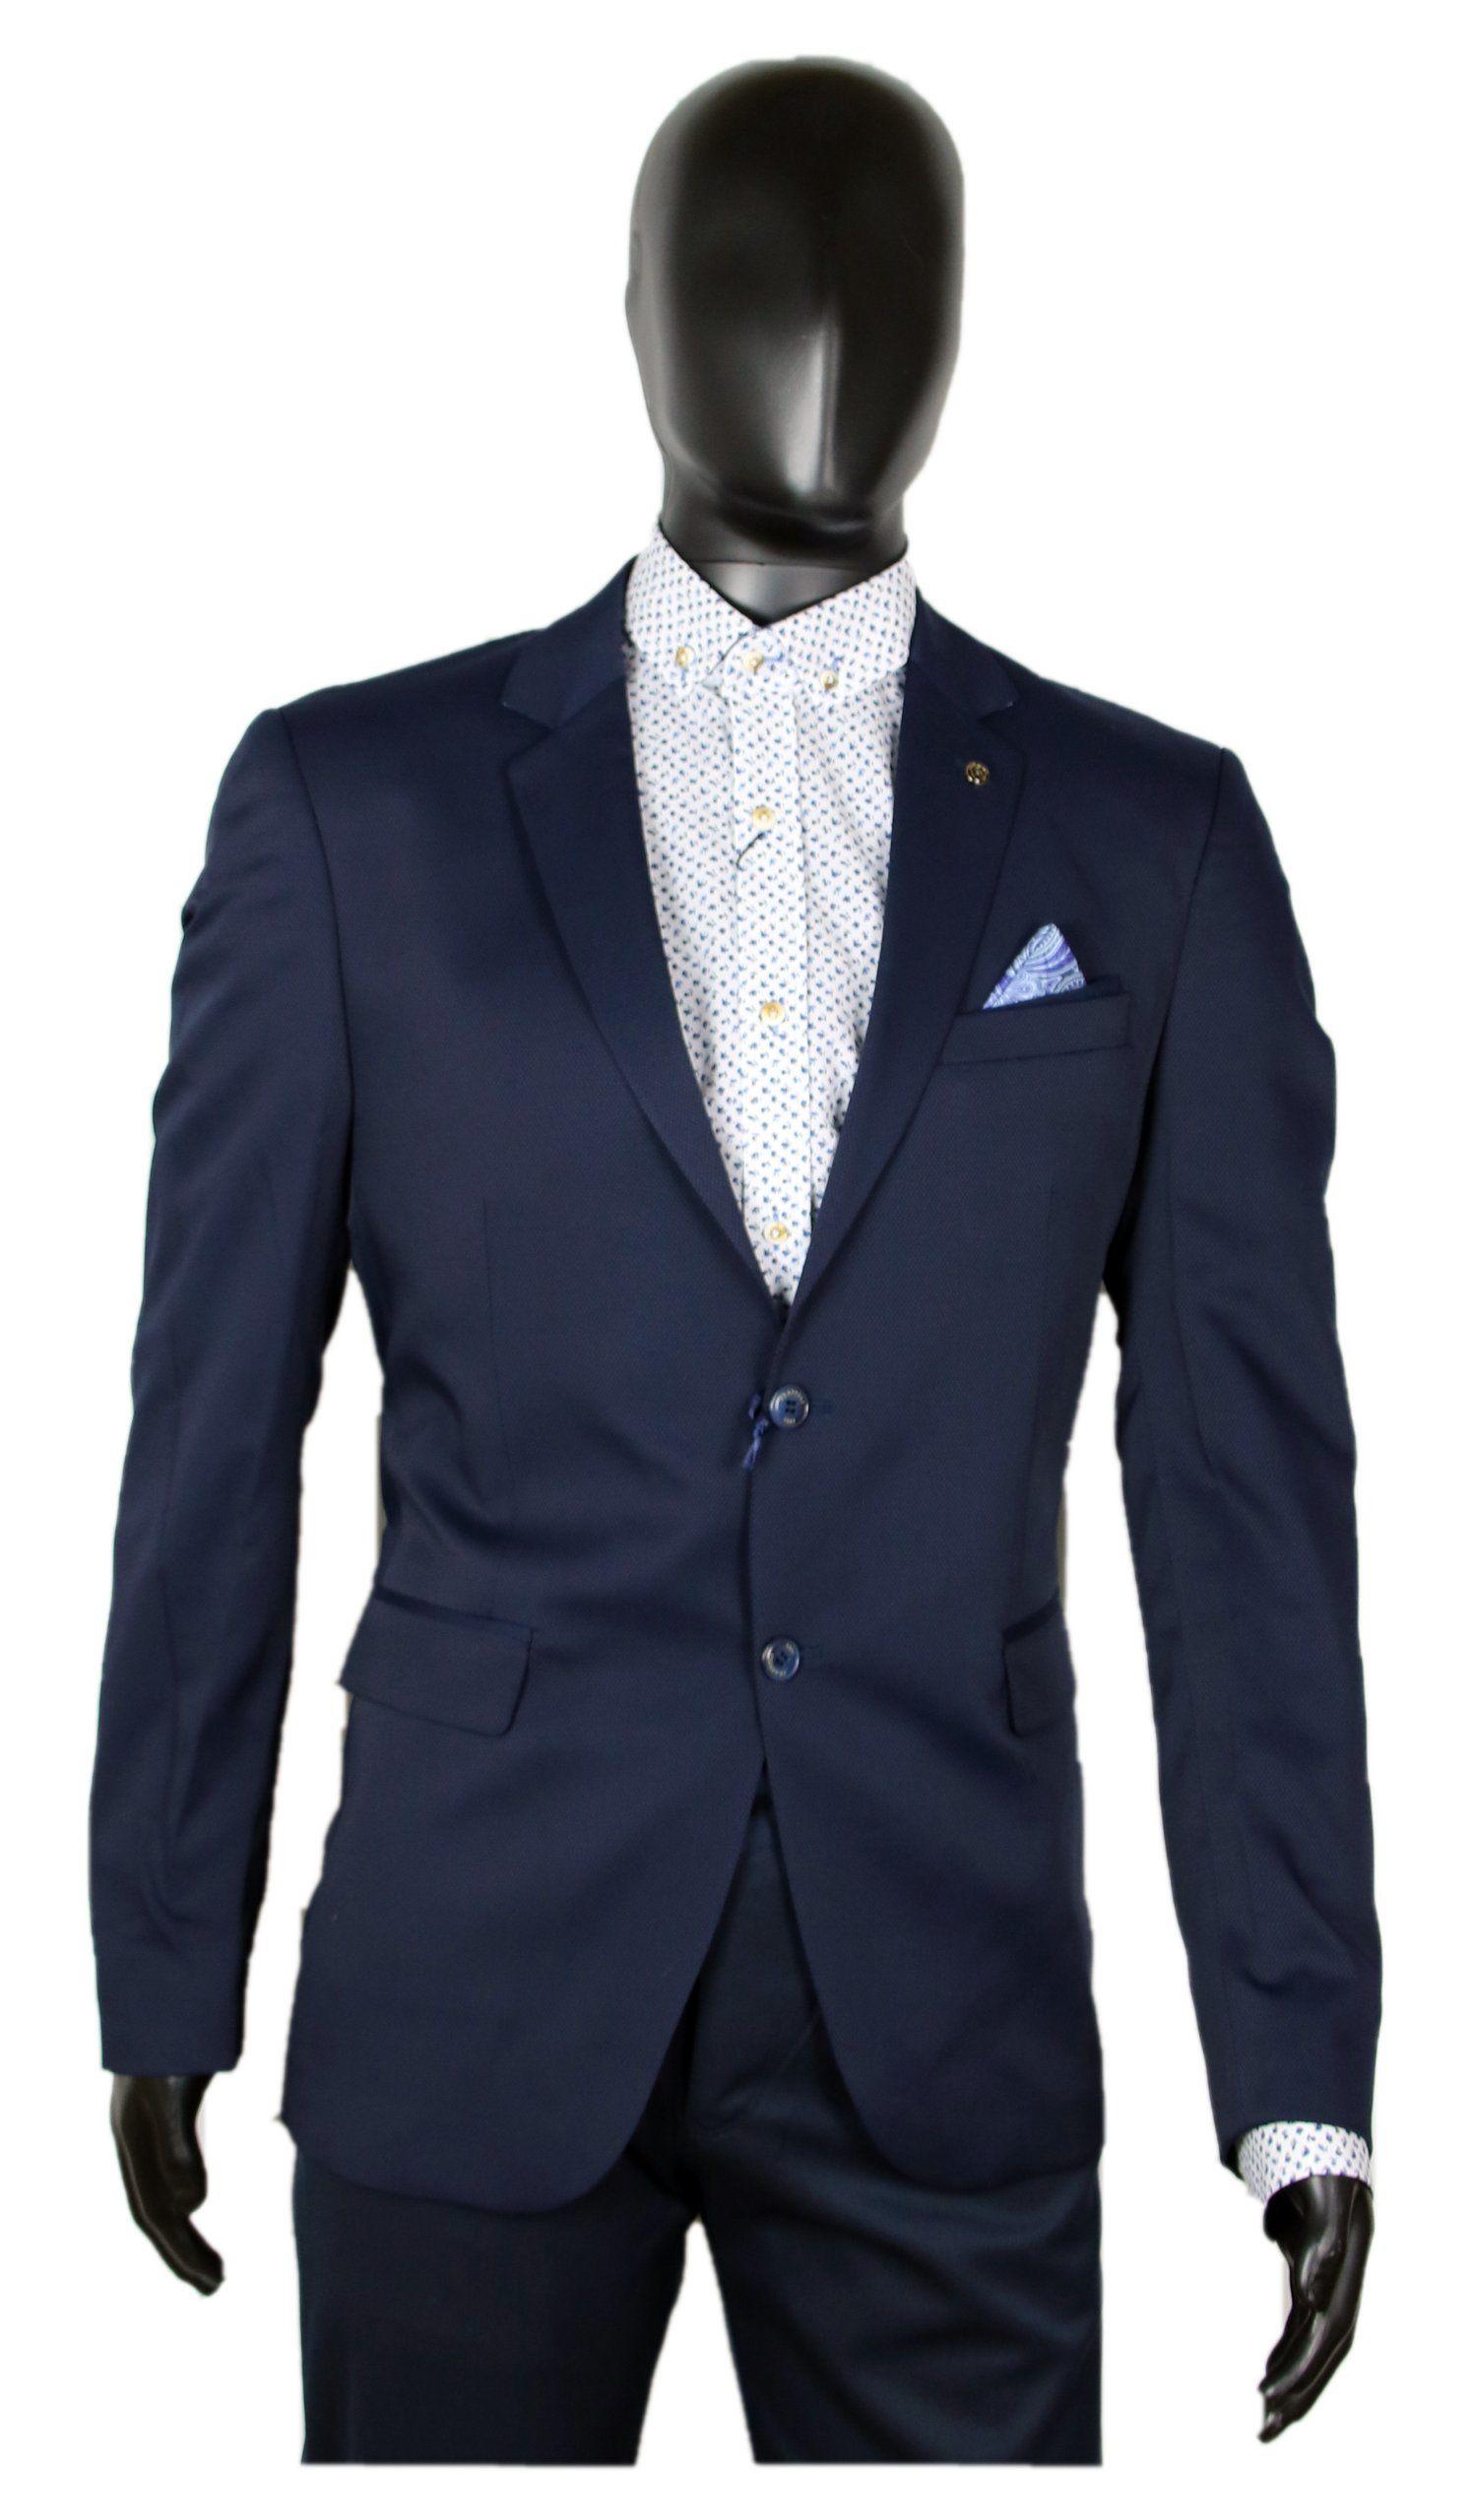 Marynarka 20m C4 98ska 20elegancka 20granatowa 20okazja 20 10 54 Suit Jacket Fashion Blazer